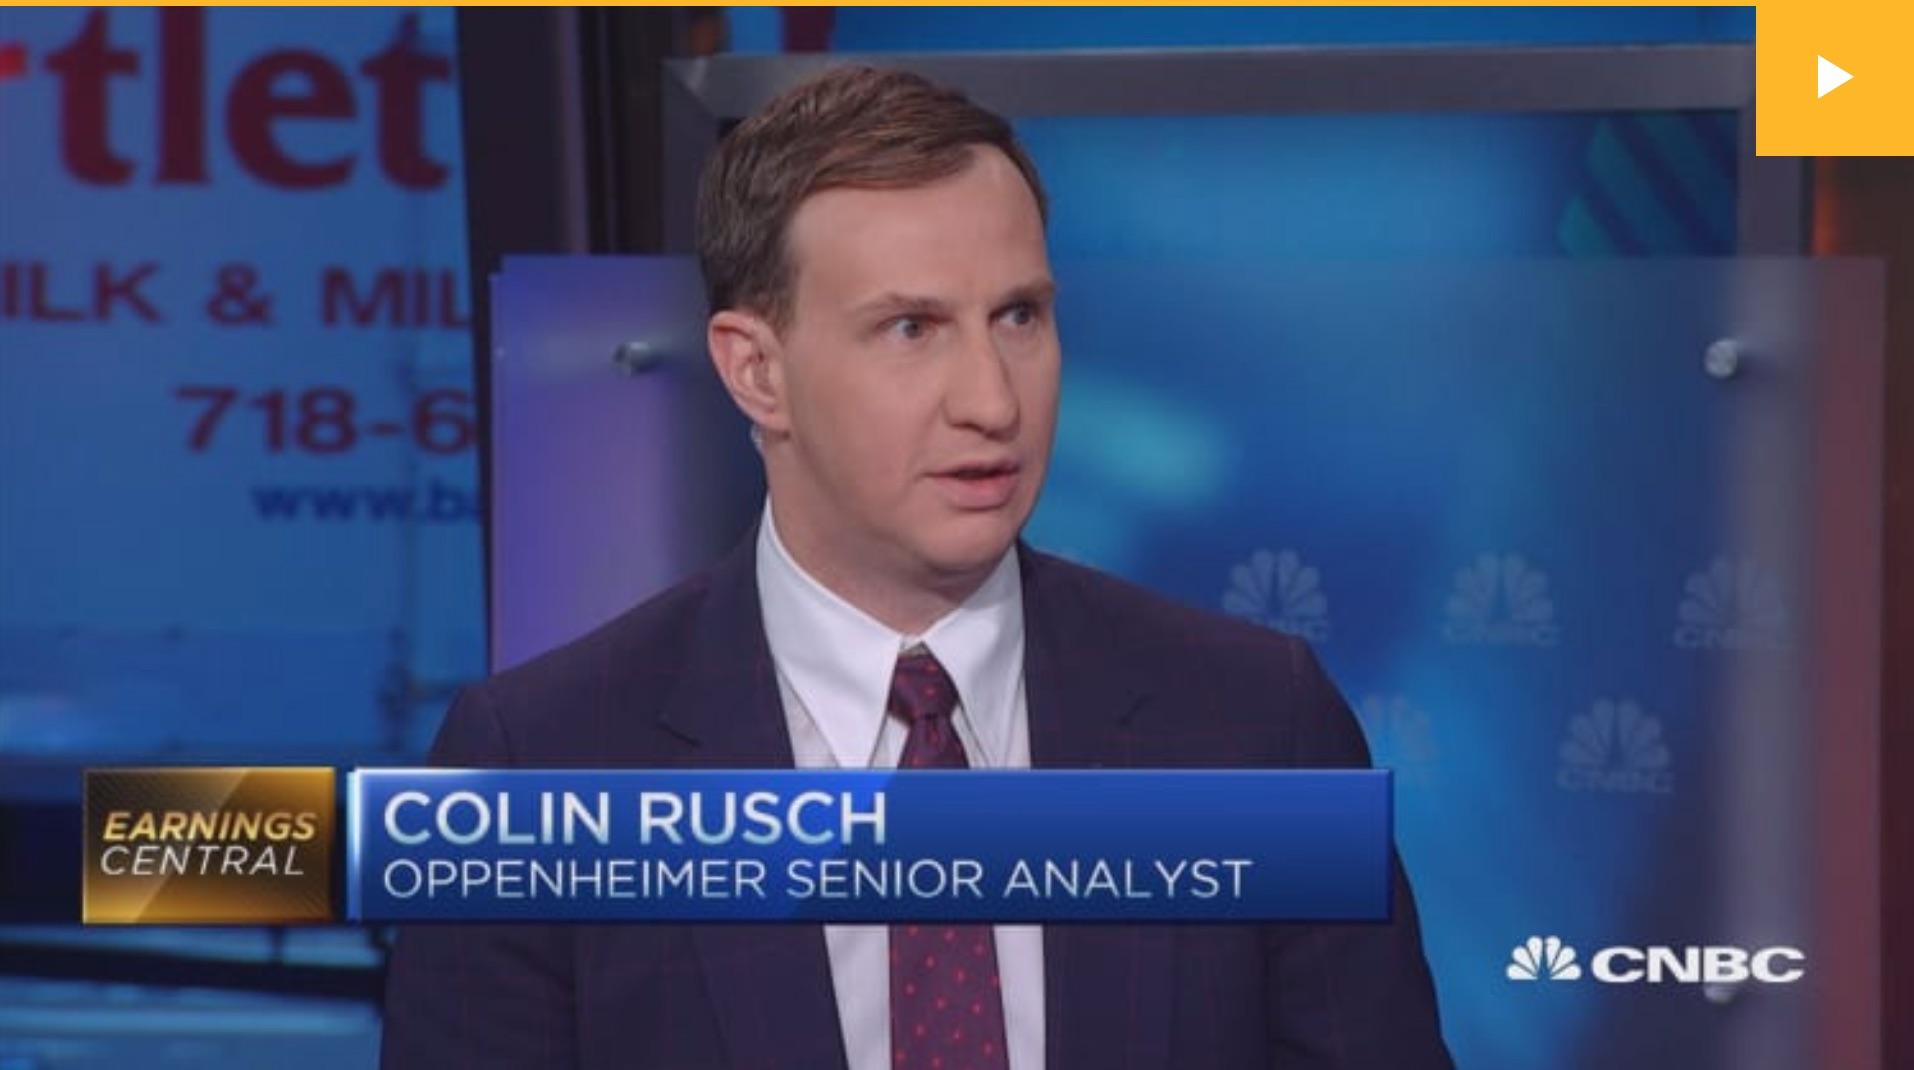 CRusch on CNBC